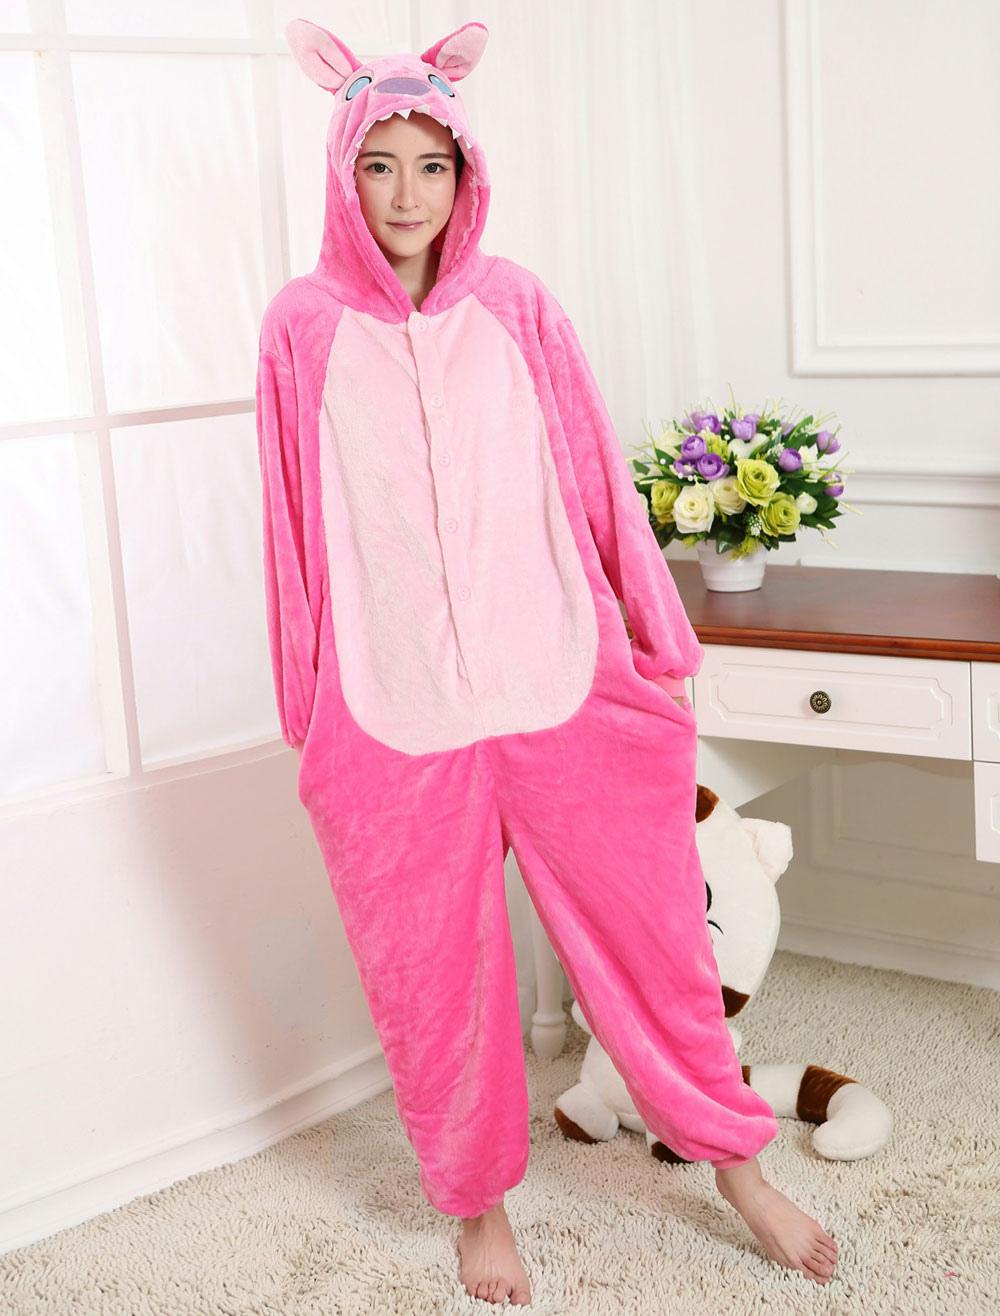 ... Kigurumi Pajama Stitch Onesie Pink Flannel Anime Sleepwear For Adult  Back With Zipper Halloween-No ... b747982b9